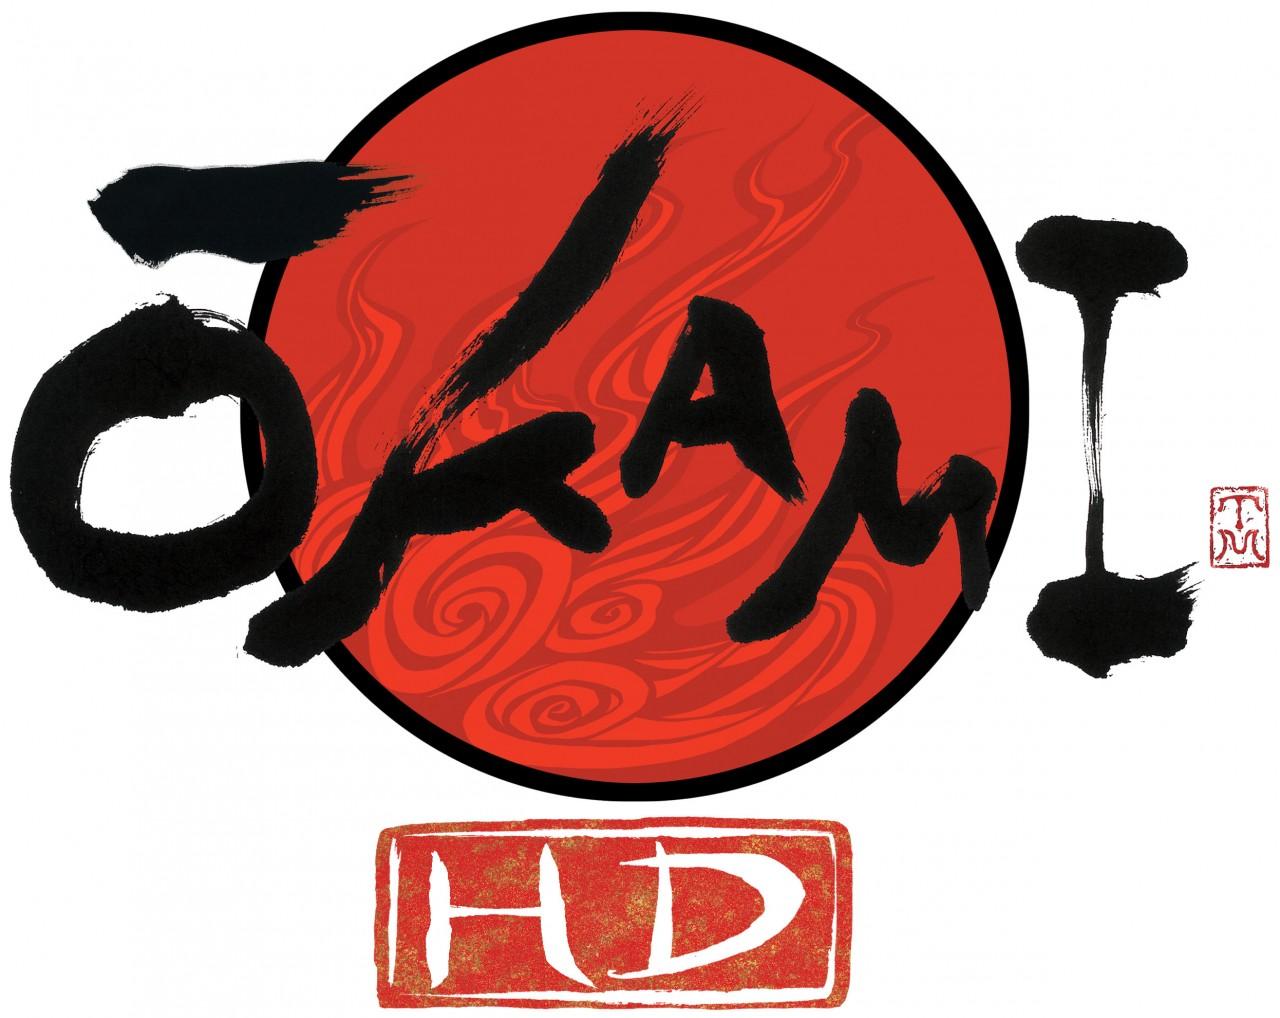 http://i.jeuxactus.com/datas/jeux/o/k/okami-hd/xl/okami-hd-artwork-4fe189c6b1270.jpg